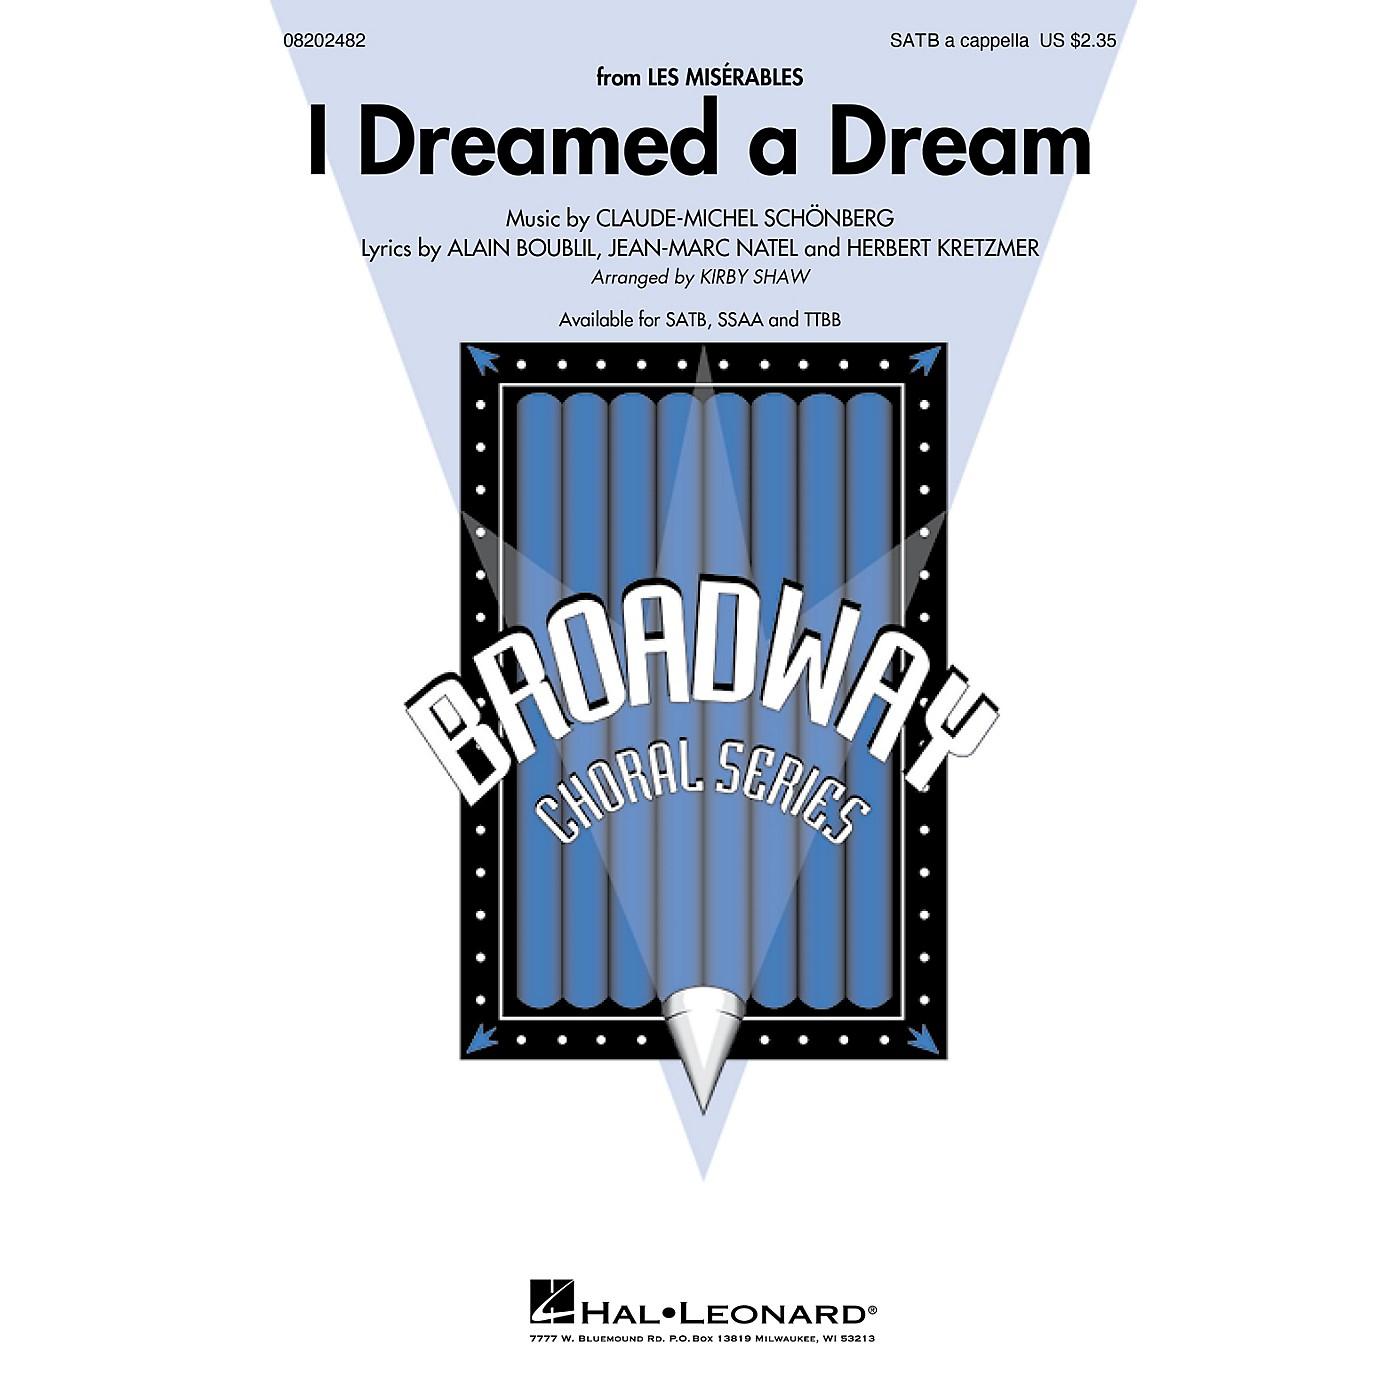 Hal Leonard I Dreamed a Dream (from Les Misérables) SATB a cappella arranged by Kirby Shaw thumbnail